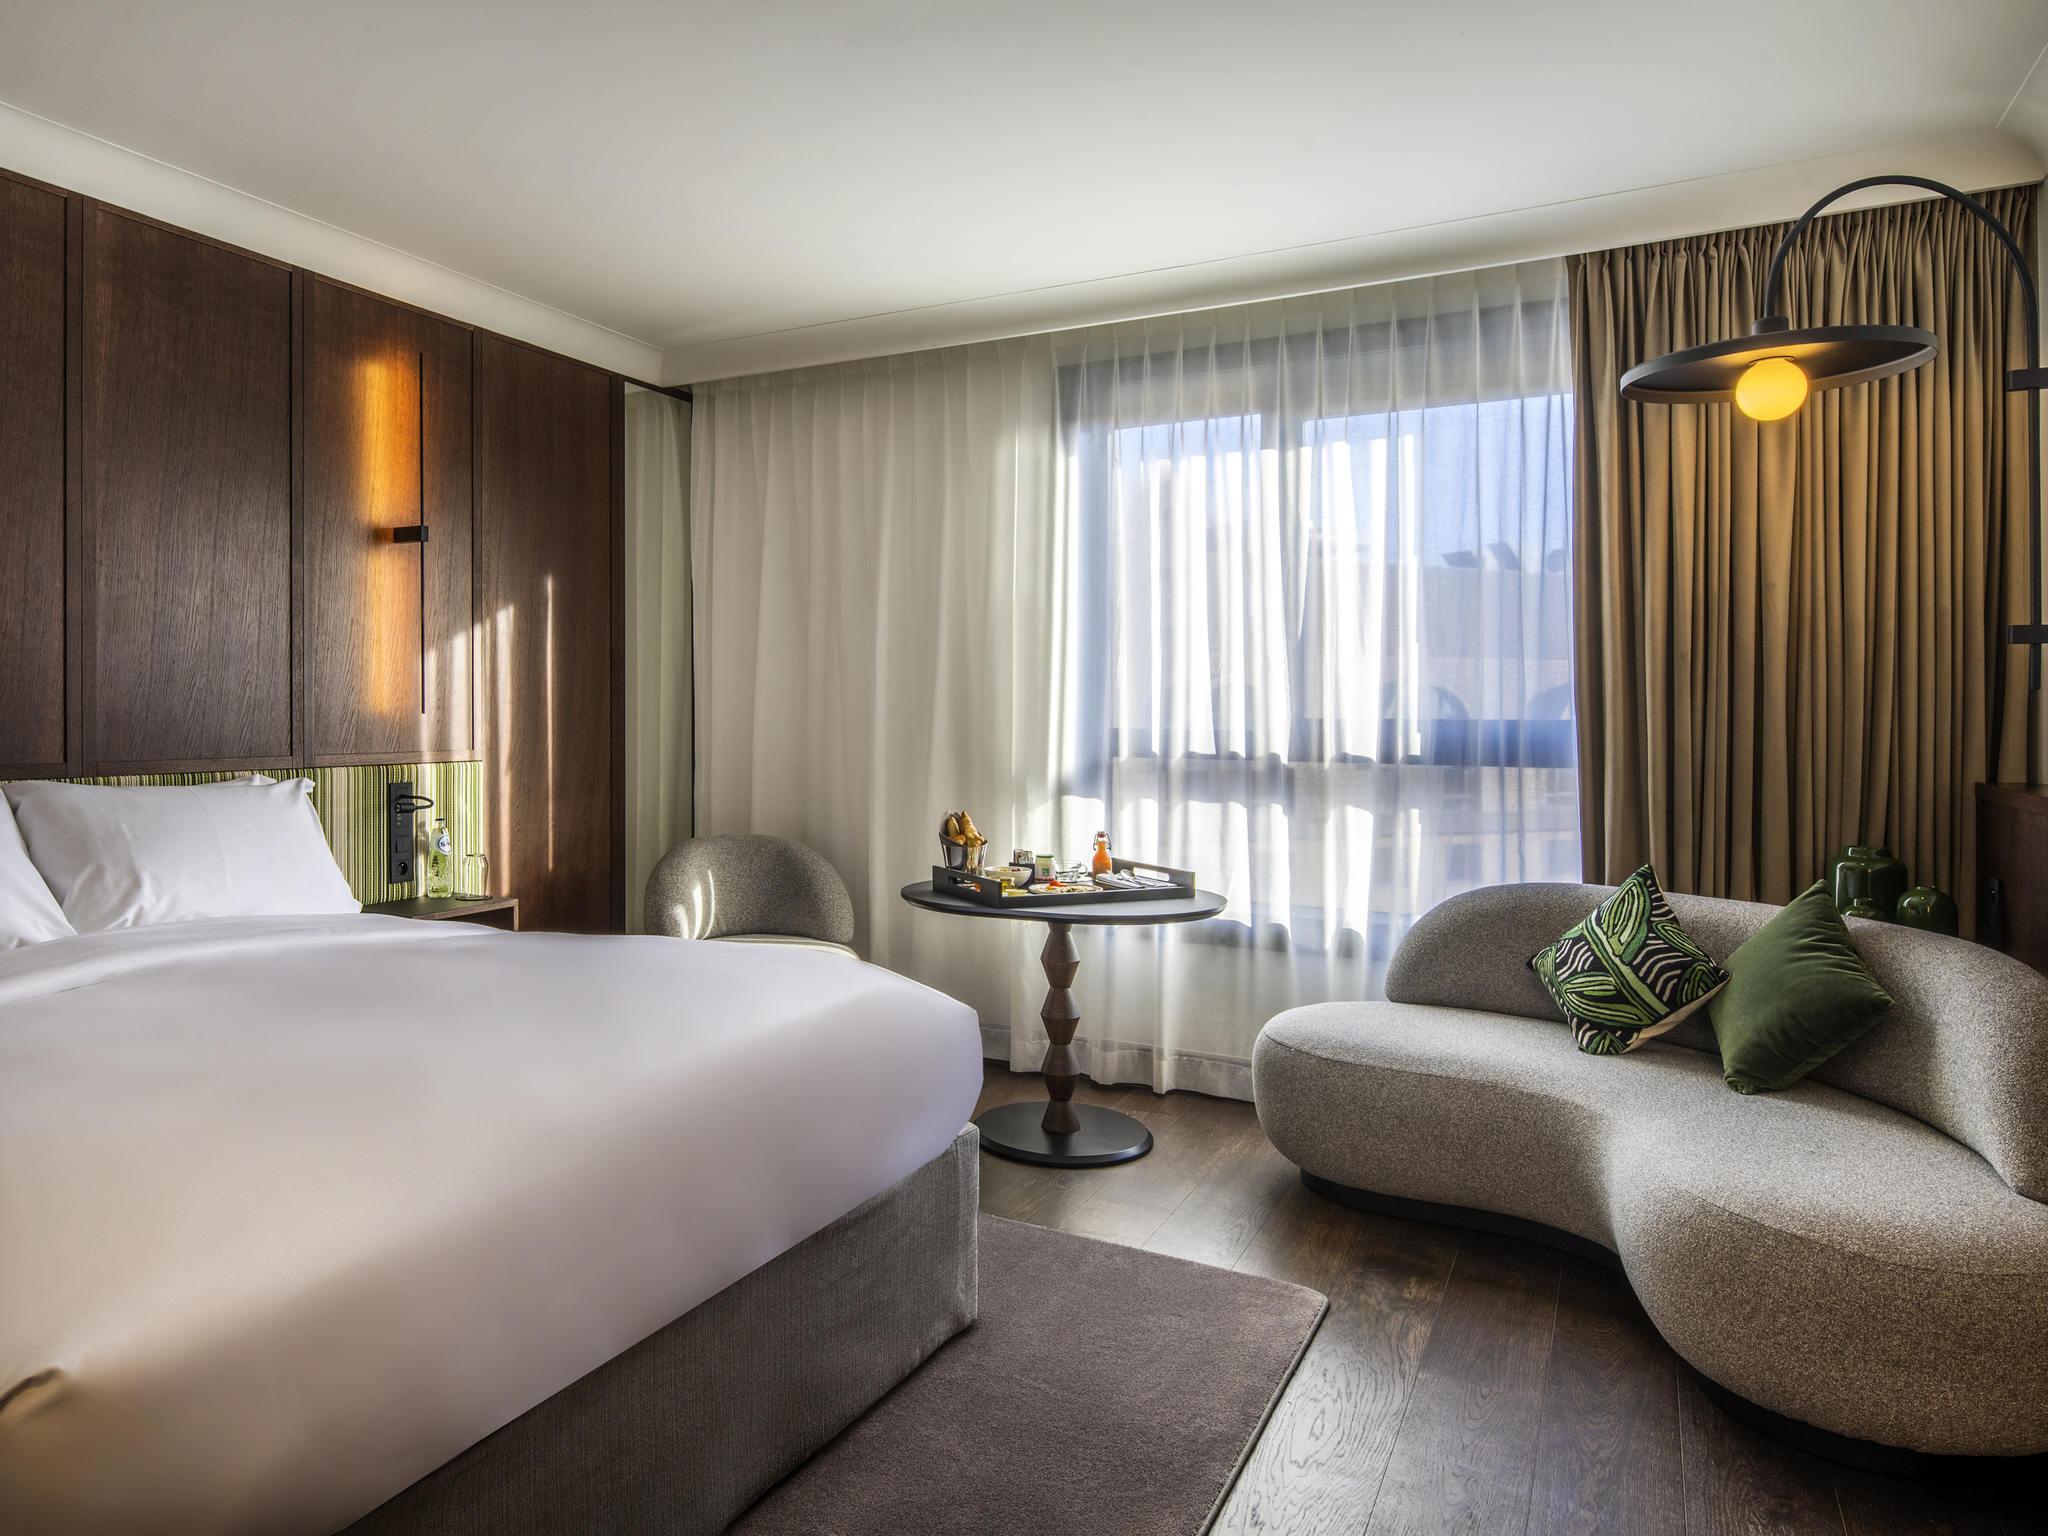 Hotel - Sofitel Brussels Le Louise